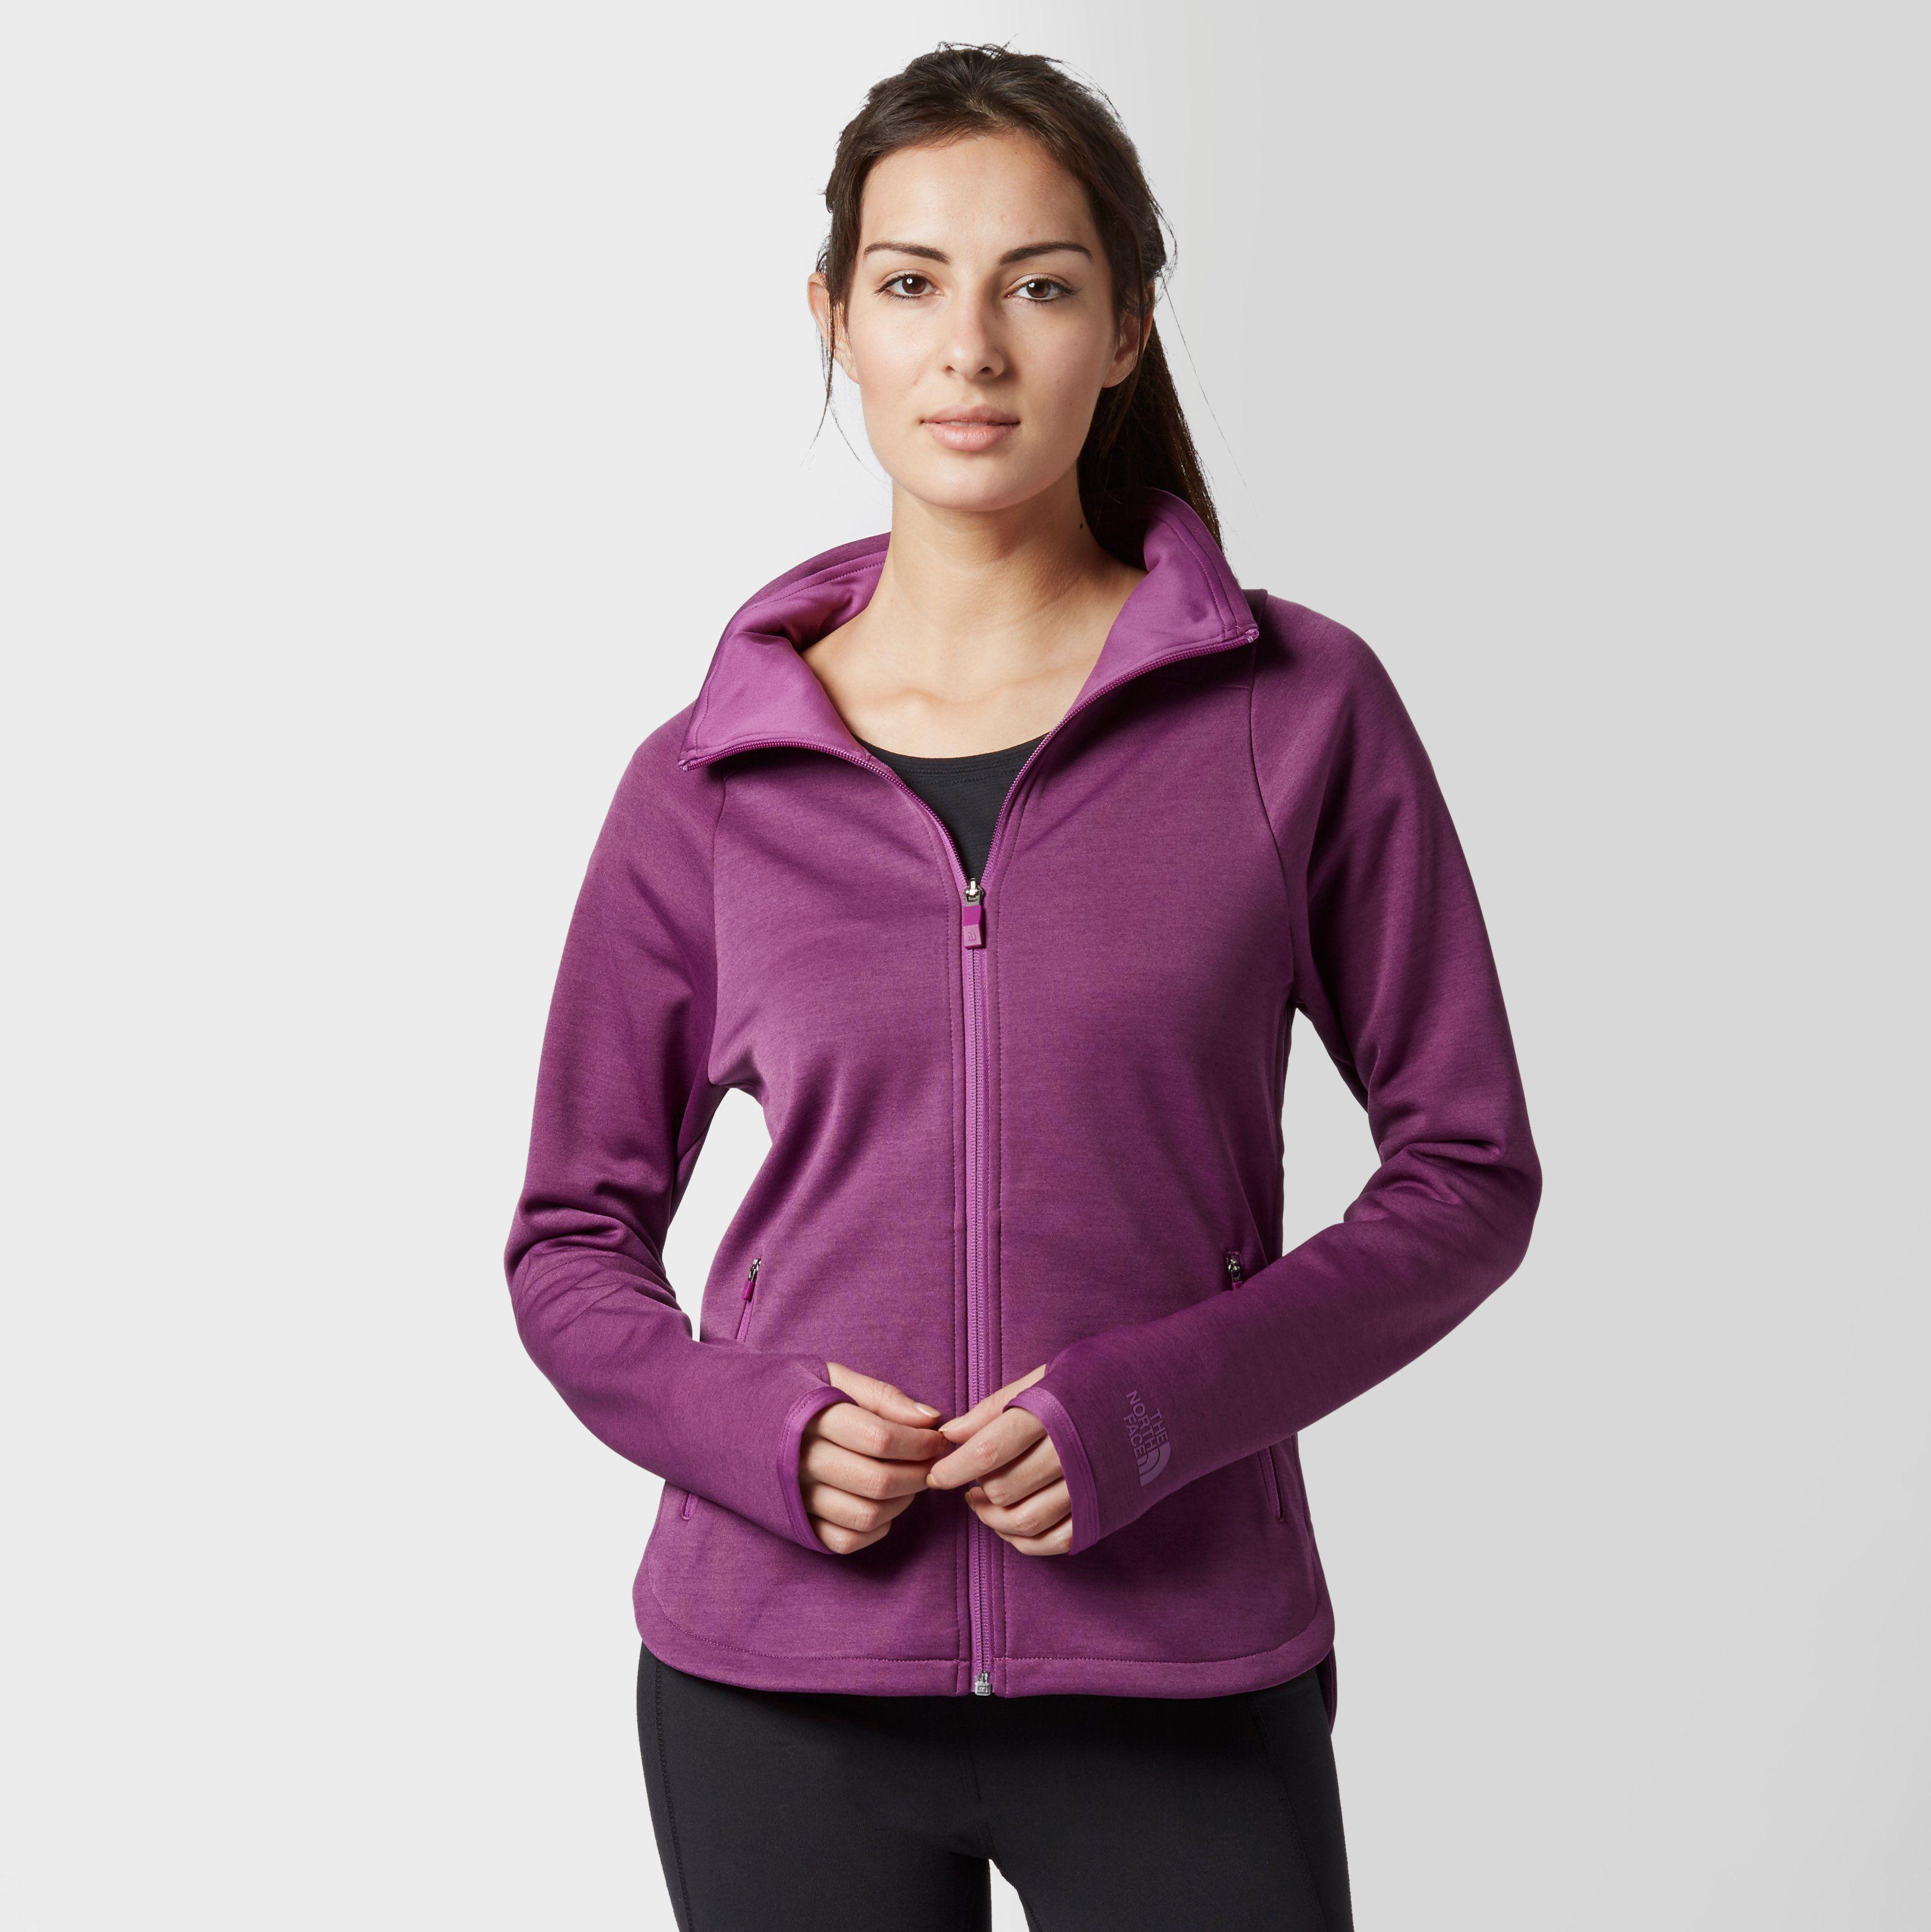 THE NORTH FACE Women's Mountain Athletics Versitas Jacket